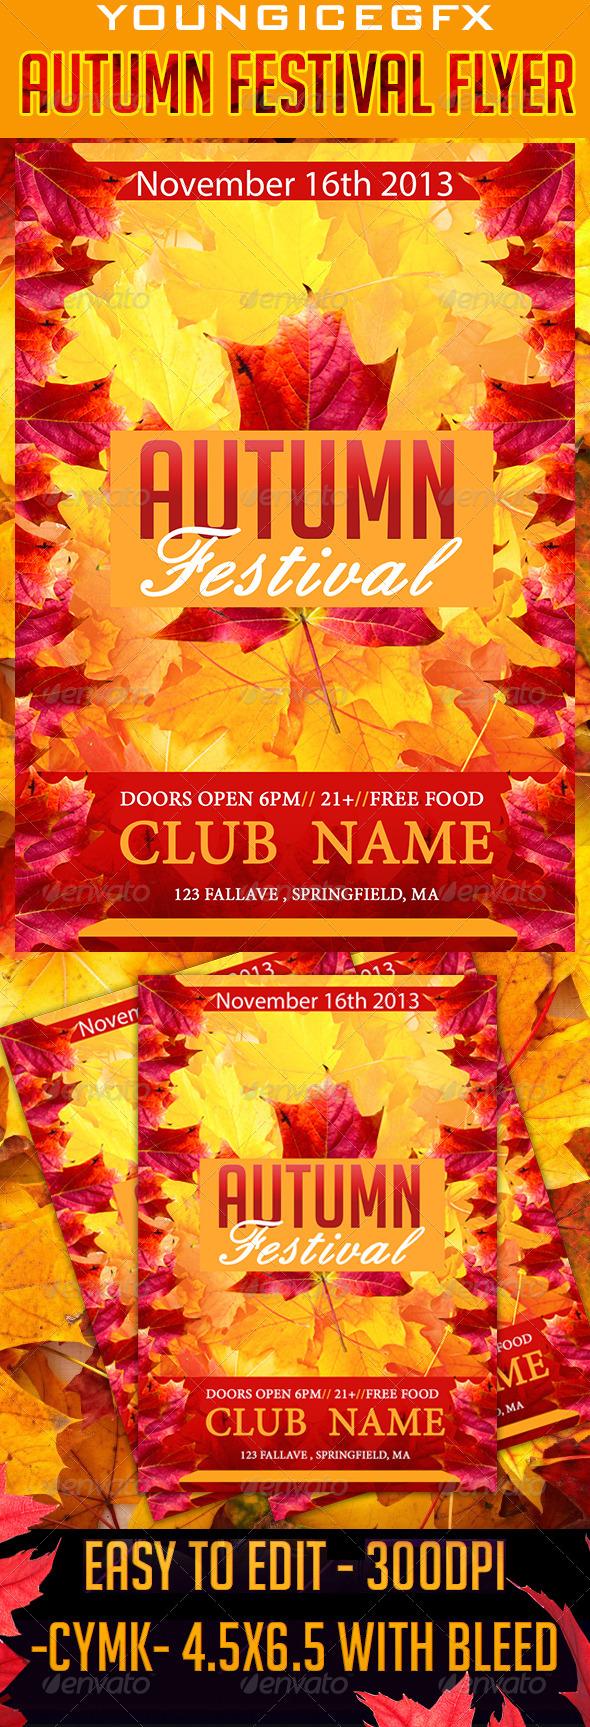 GraphicRiver Autumn Festival Flyer 5790879